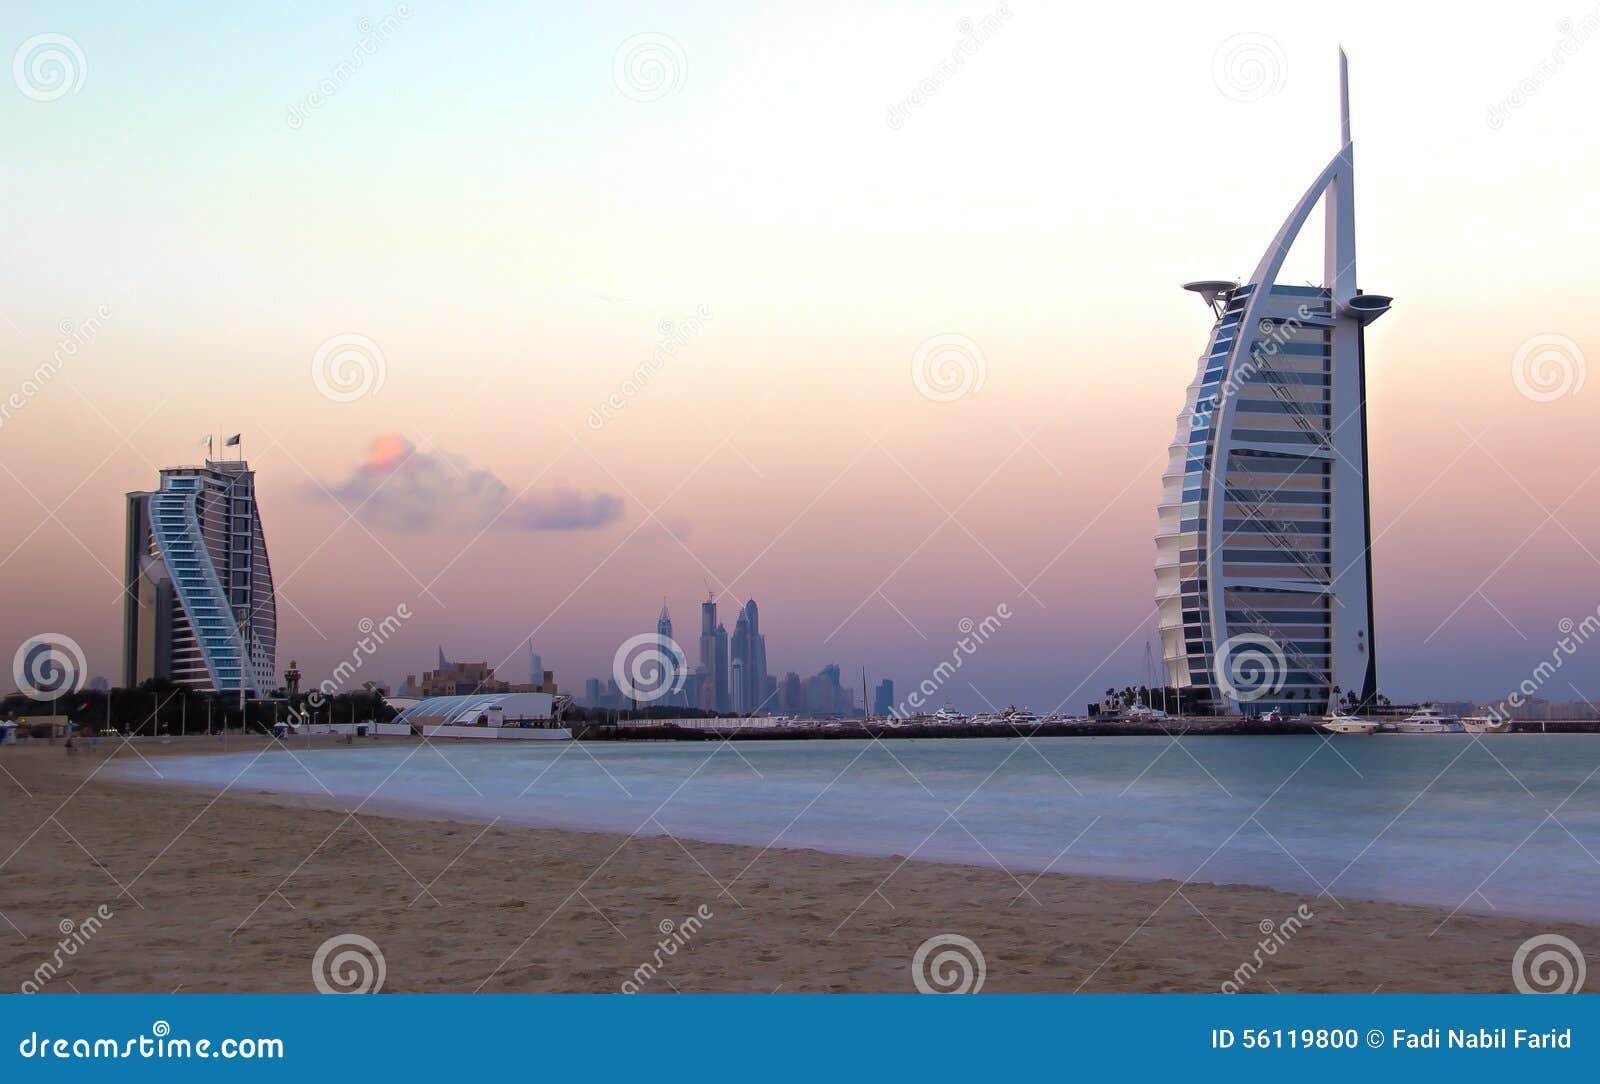 Burj al arab 7 star hotel dubai sunrise stock photo for Burj al arab 7 star hotel